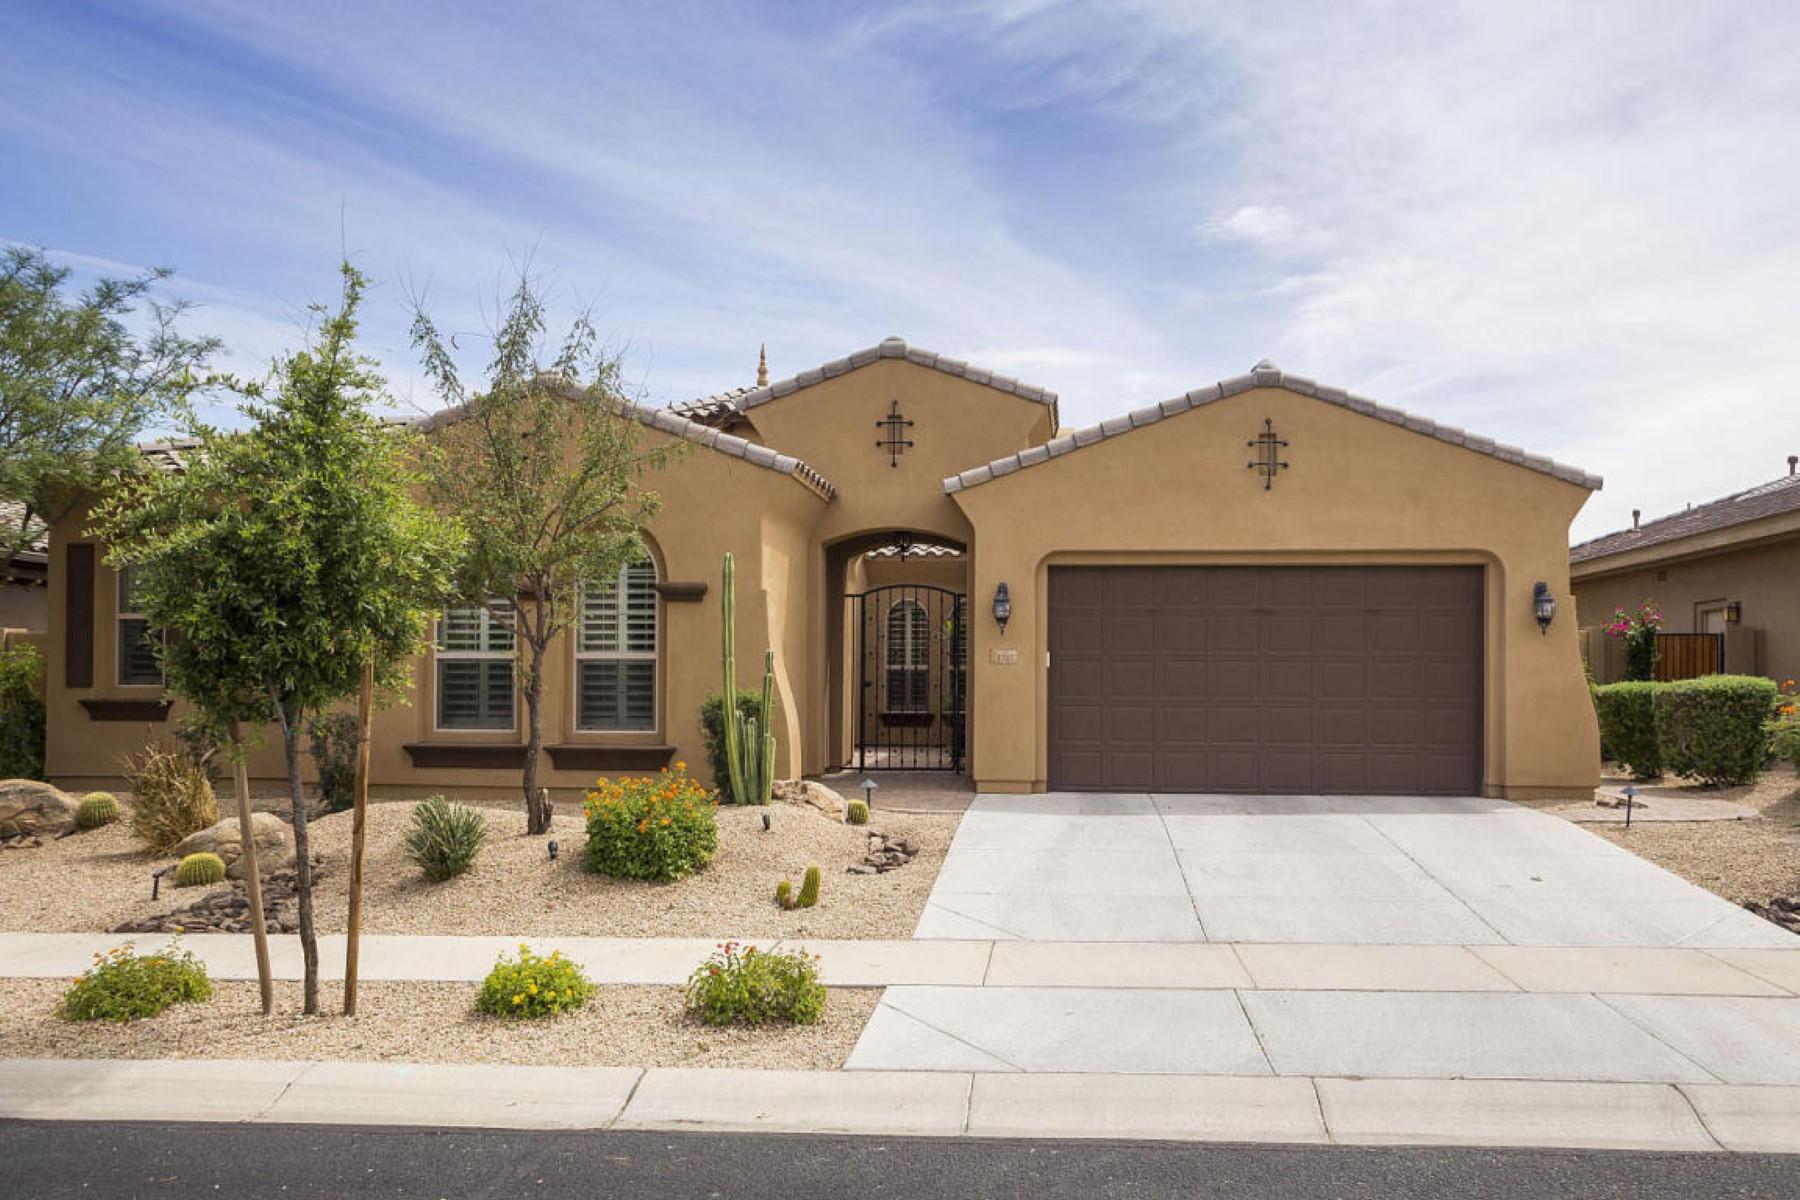 Частный односемейный дом для того Продажа на Impeccable TW Lewis home in the gated community of Desert Springs 1707 W SLEEPY RANCH RD Phoenix, Аризона 85085 Соединенные Штаты